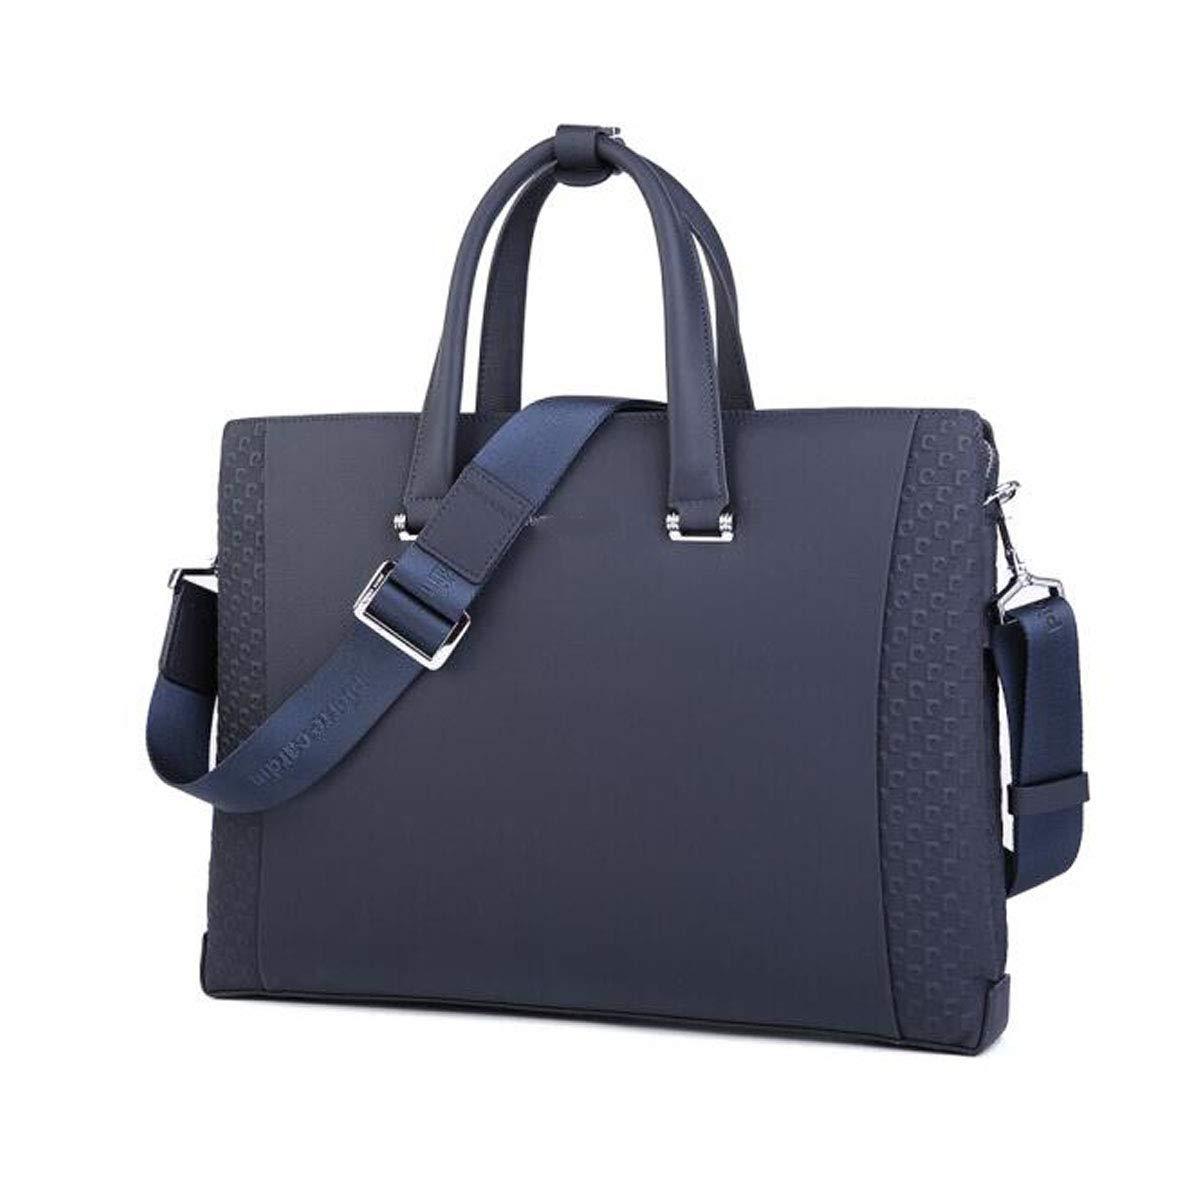 Hengxiang メッセンジャーバッグ、ラップトップブリーフケース、ビジネスメンズバッグ、レザーメンズメッセンジャーバッグ、レザーショルダースランコンピューターバッグ、ブラックサイズ:405.529cm ビジネスオフィスメッセンジャーバッグ(色:ブルー)   B07P7G7VHB